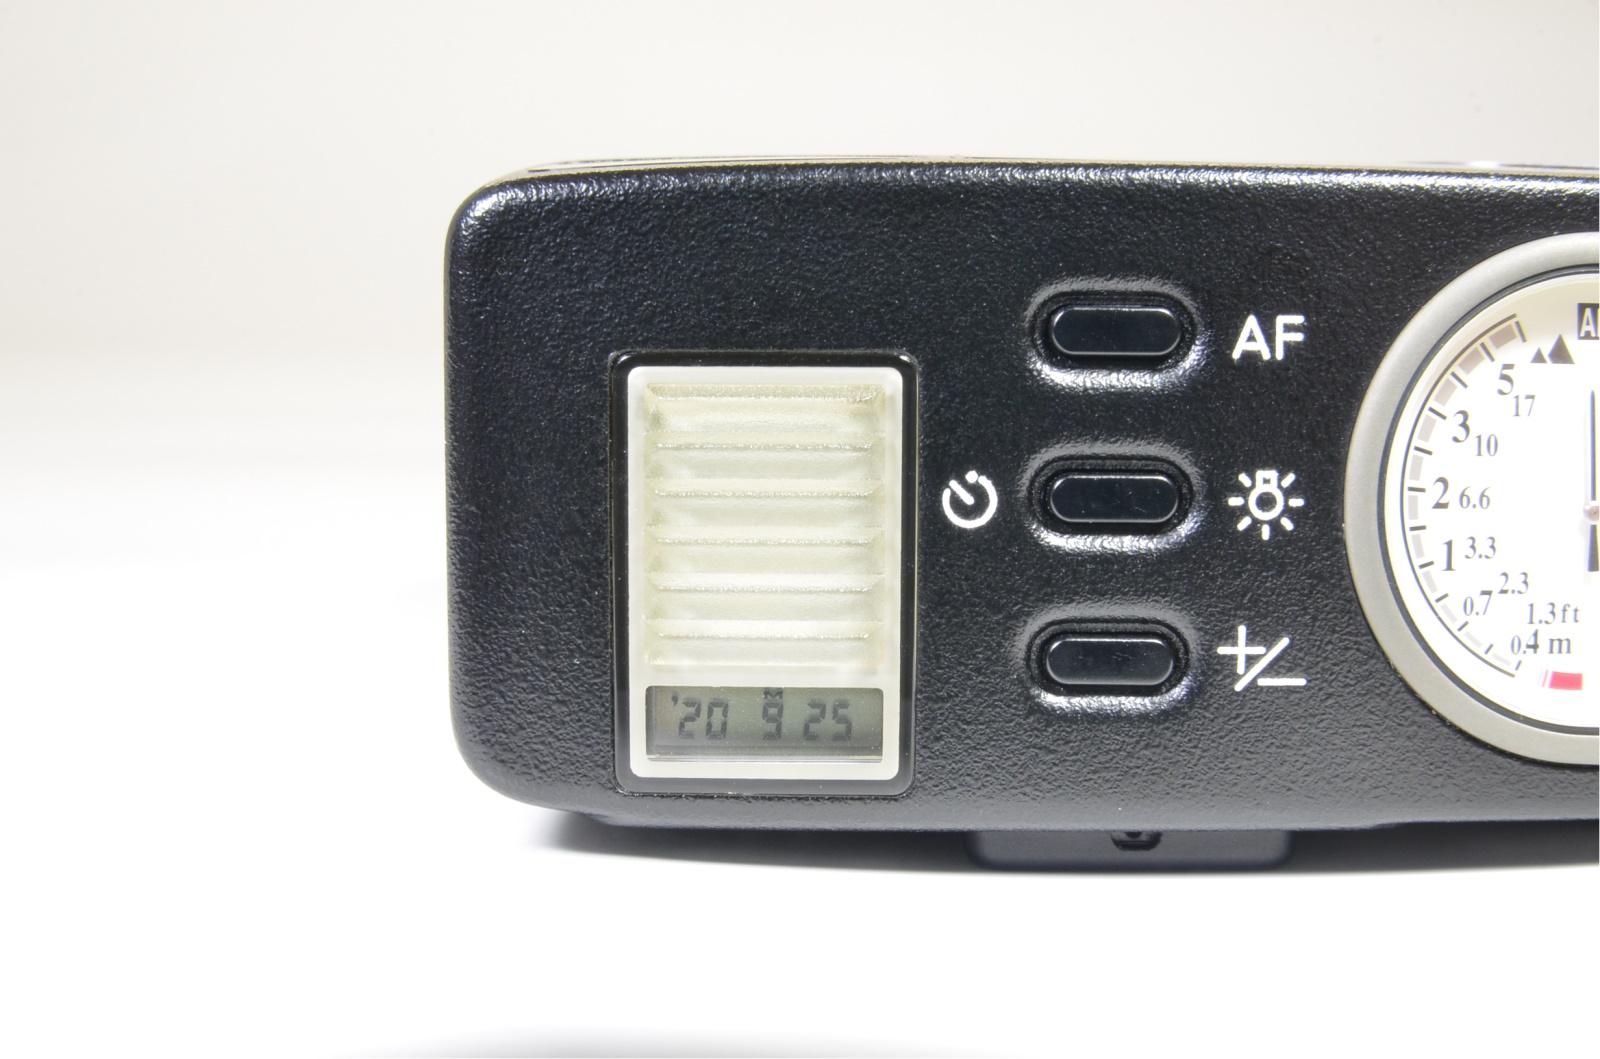 nikon 28ti p&s 35mm film camera lens 28mm f2.8 shooting tested